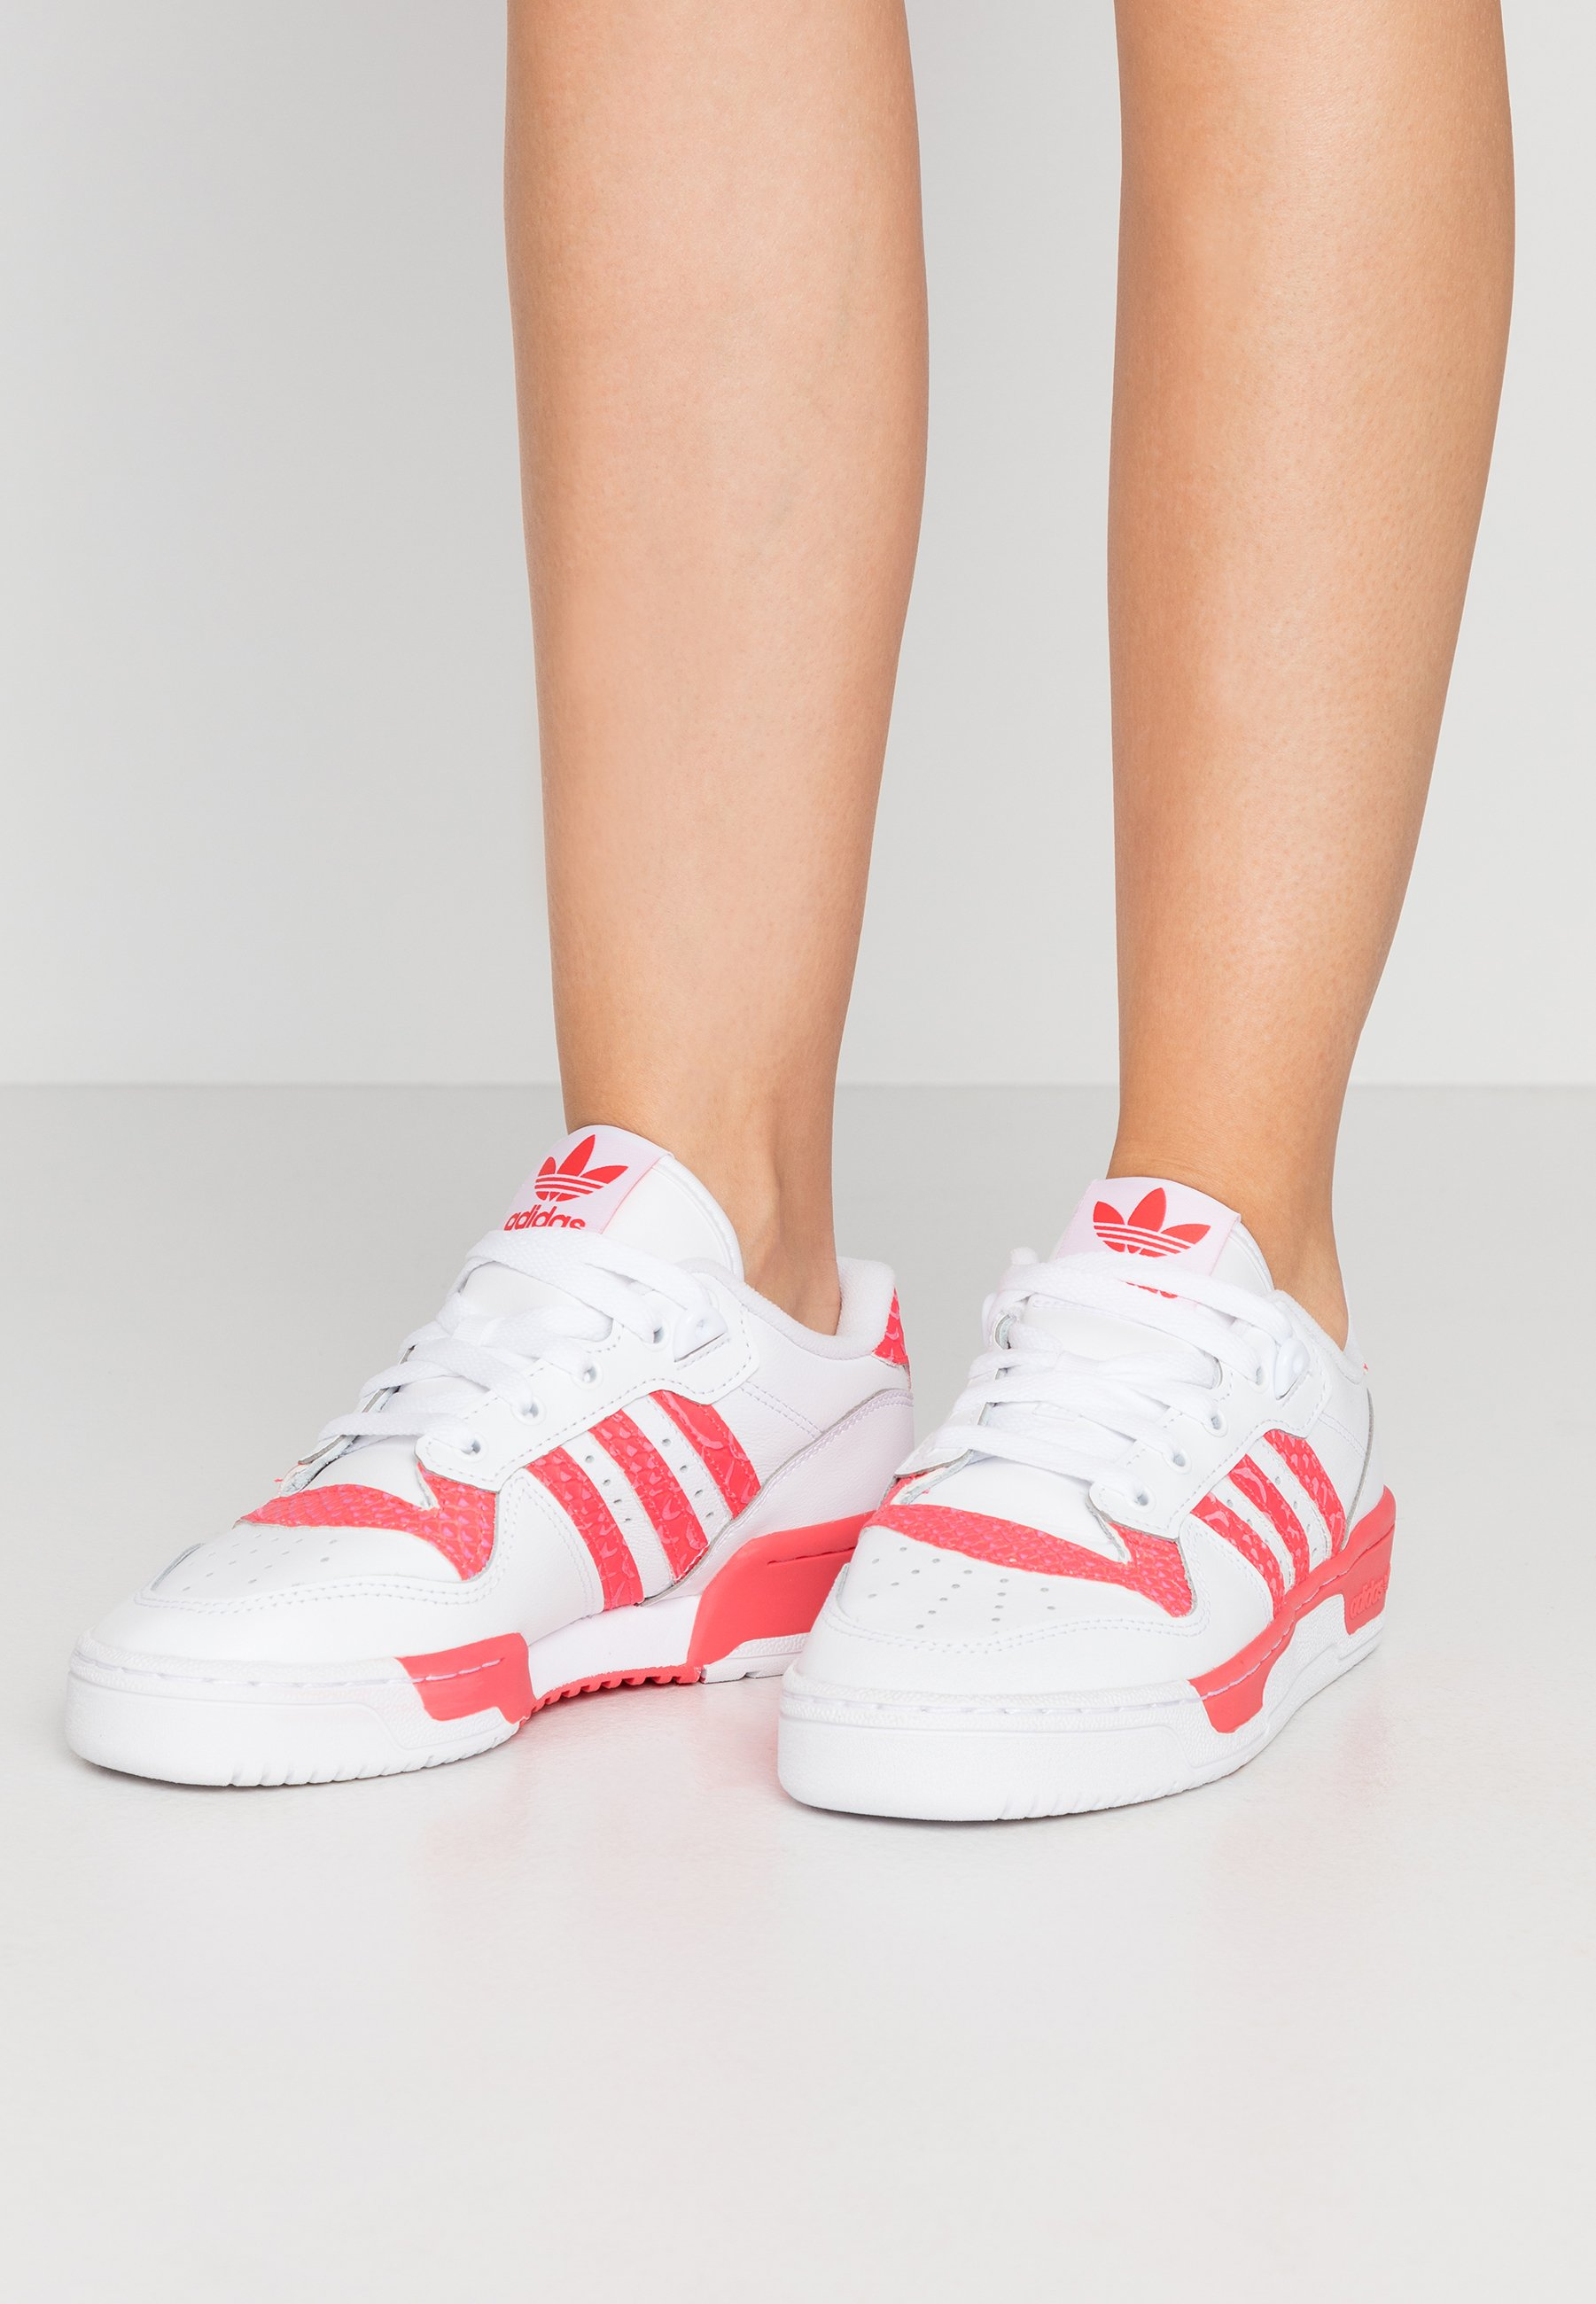 adidas Originals RIVALRY Sneakers footwear whiteshock